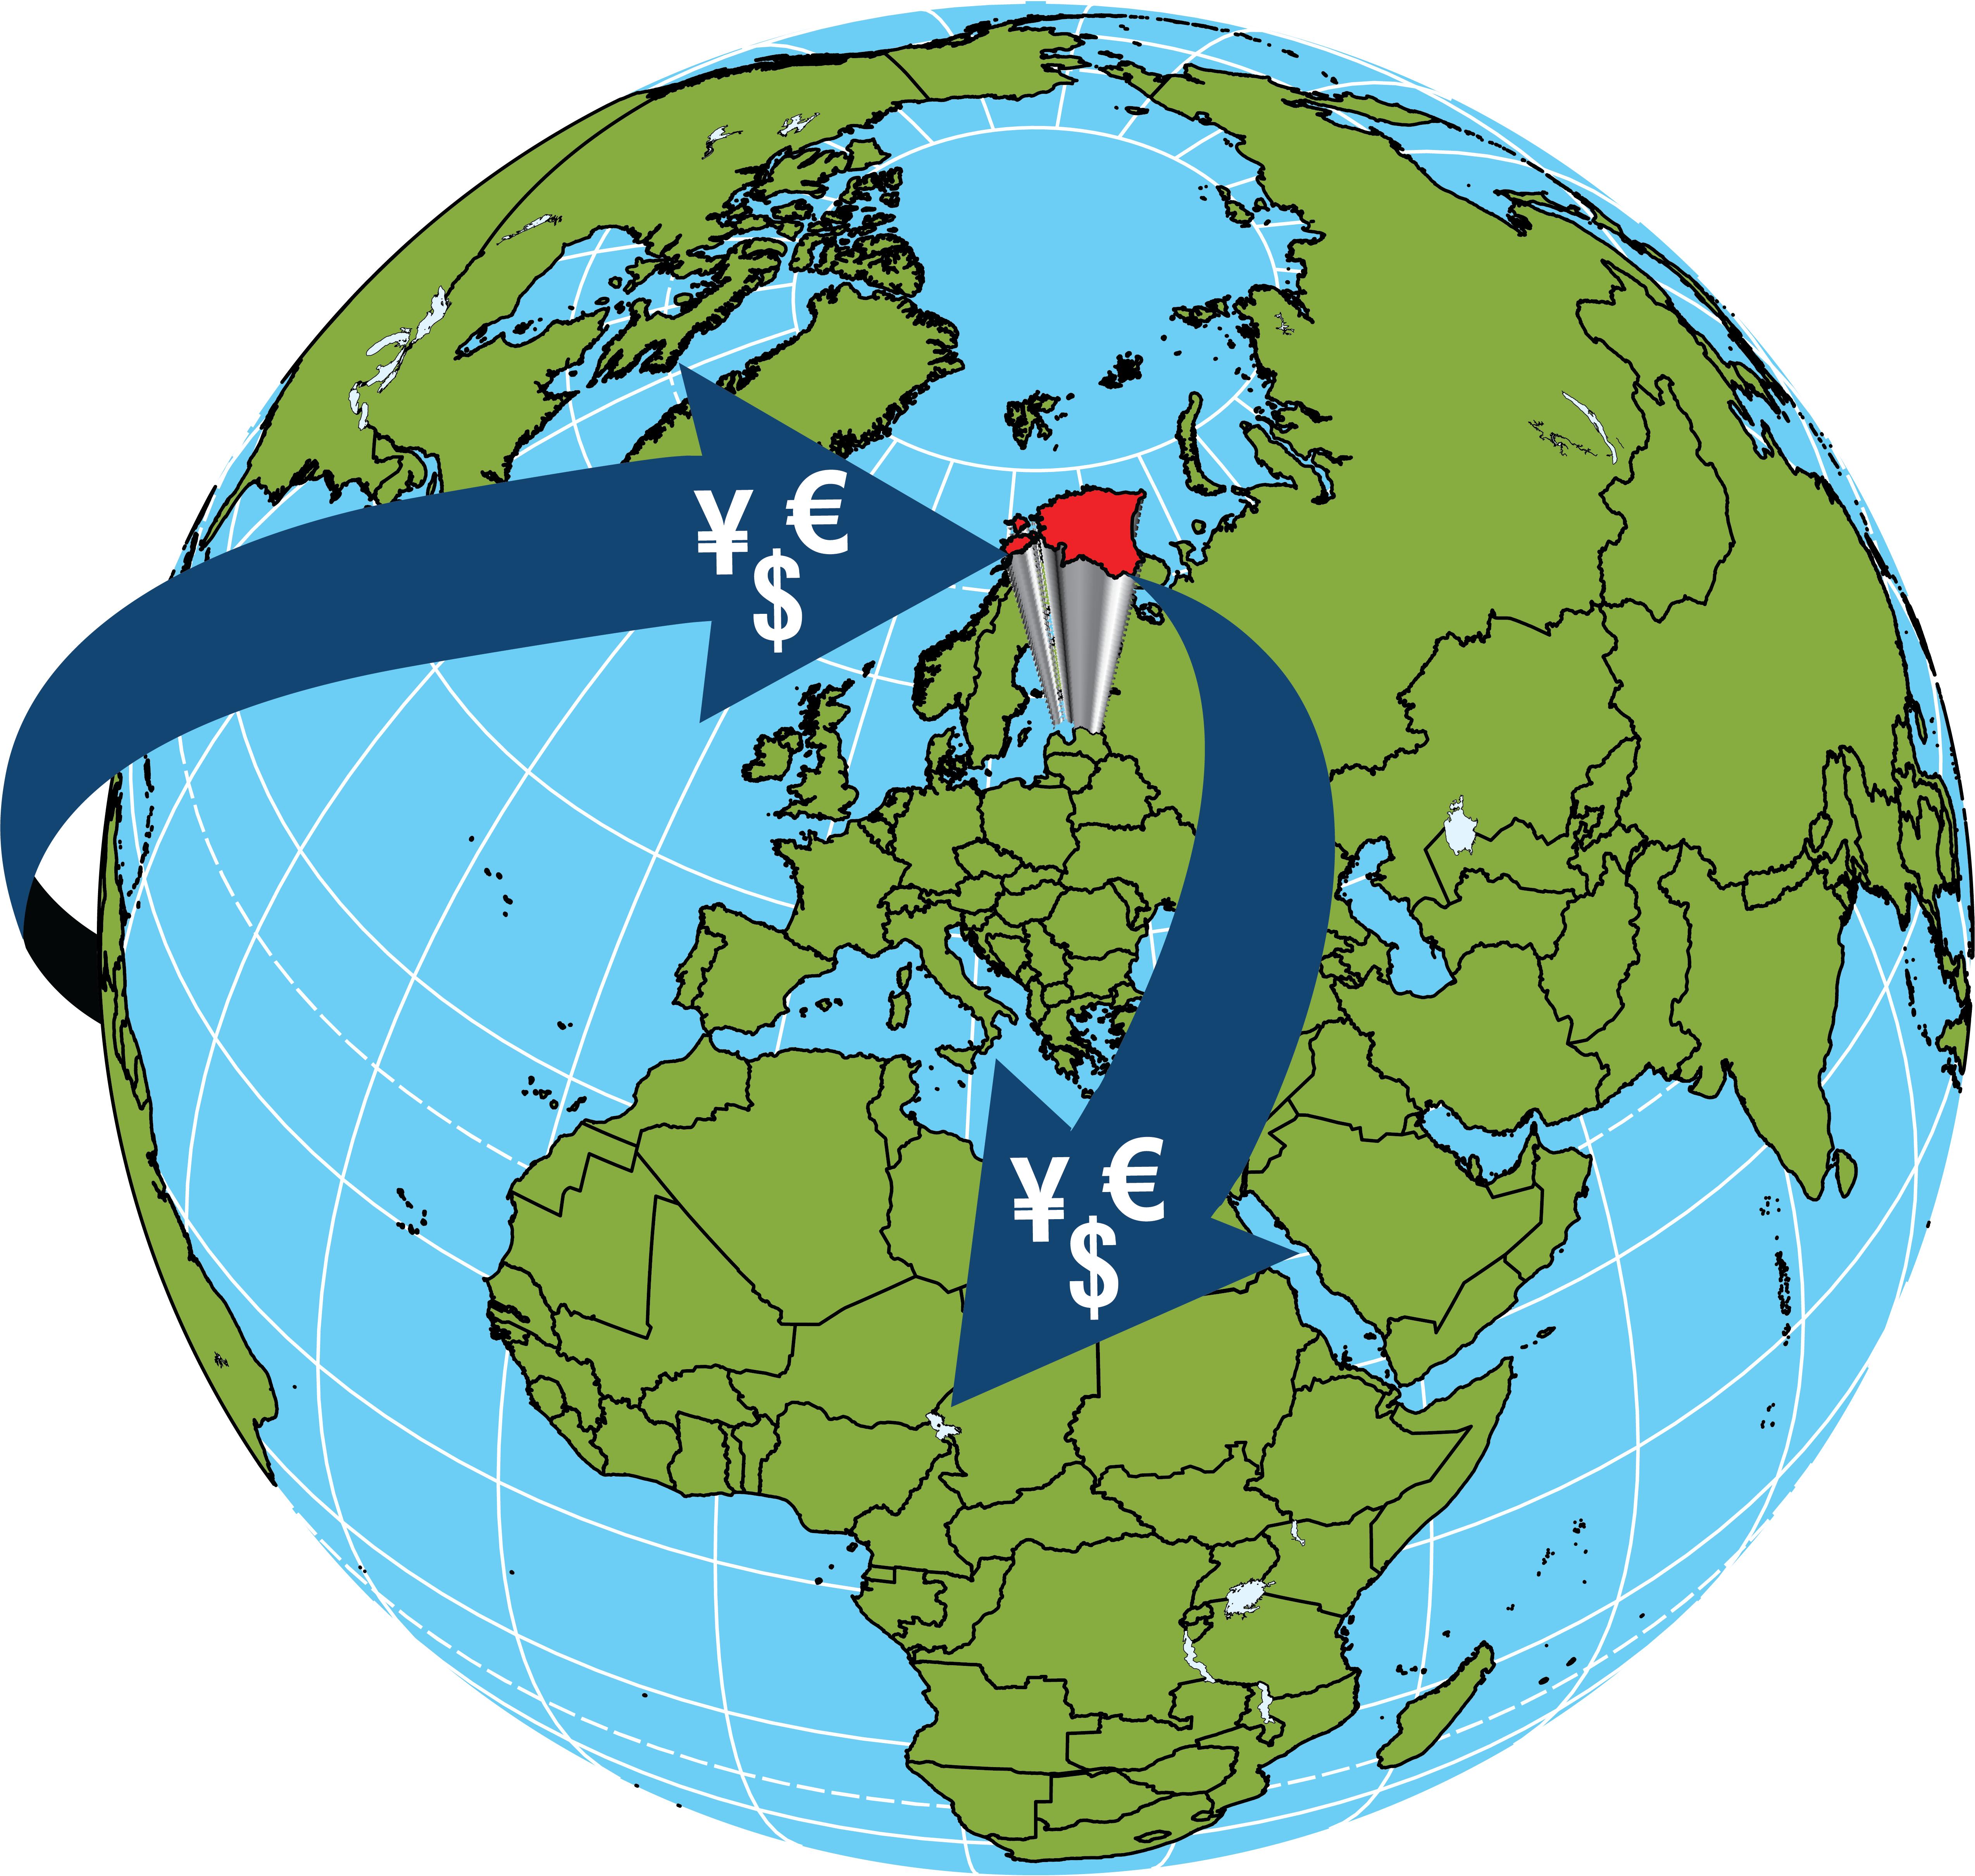 Estonia: Current Account Balance